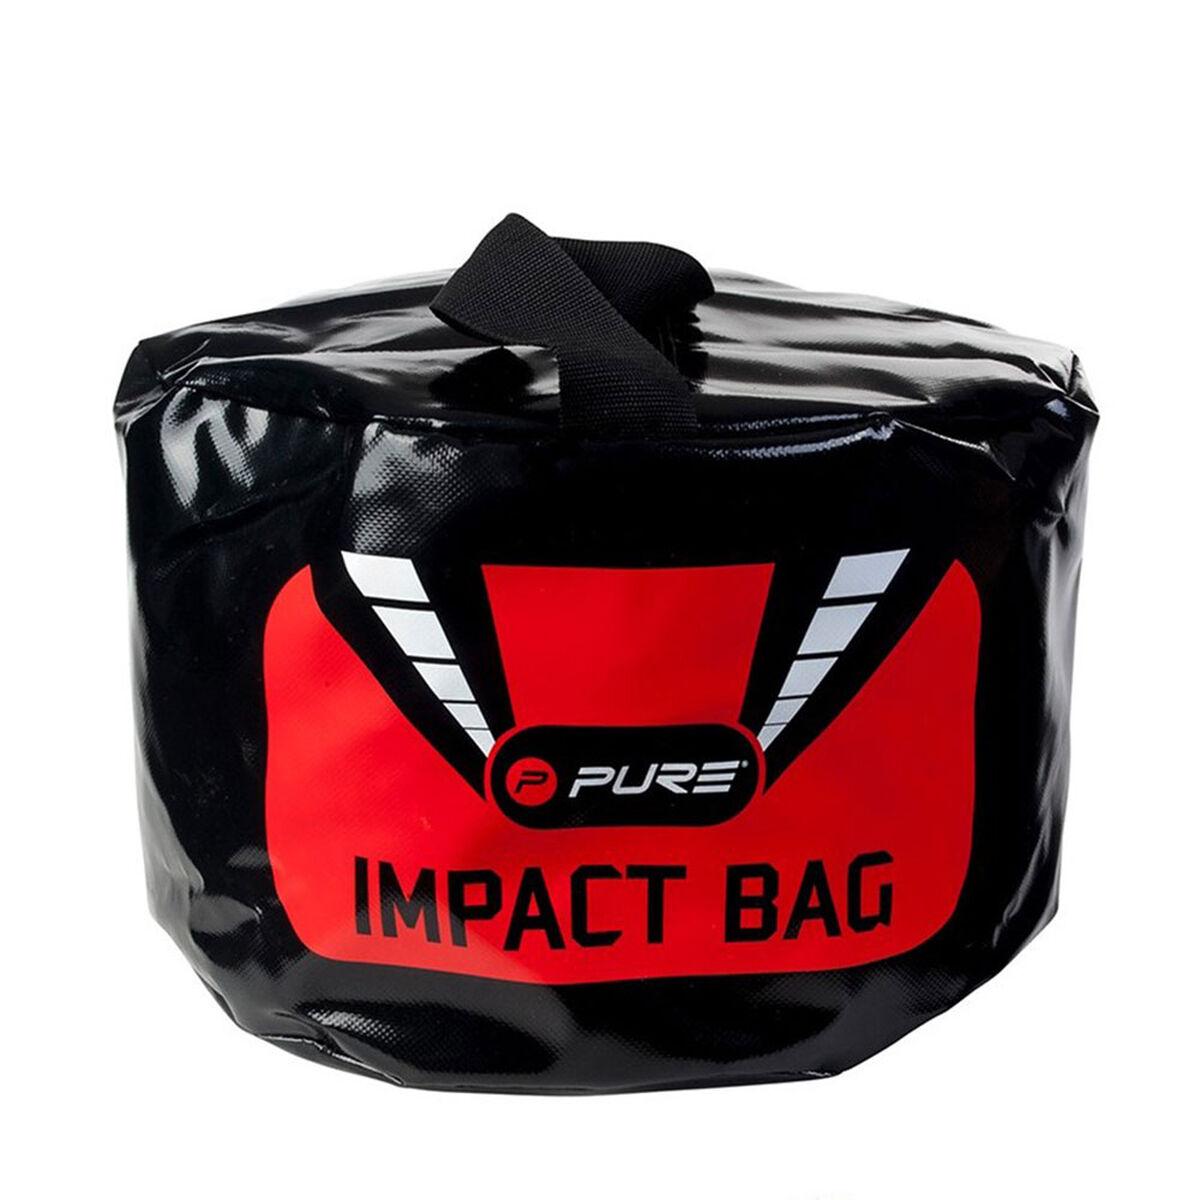 Pure 2 Improve Impact Bag, Male, Black, One Size   American Golf